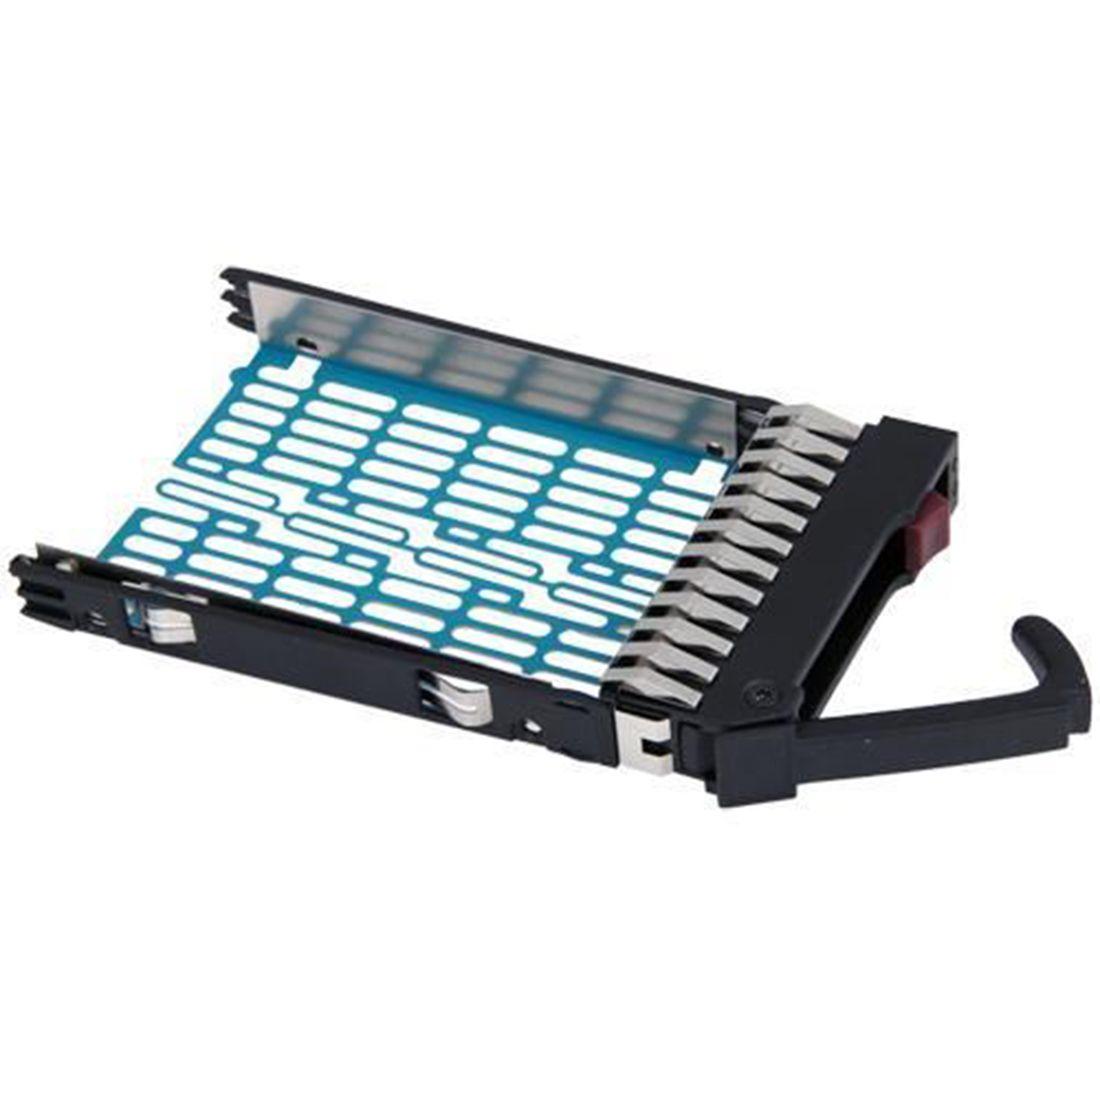 2.5 Inch SATA HDD Hard Drive Tray Caddy Bracket For HP Computer ...